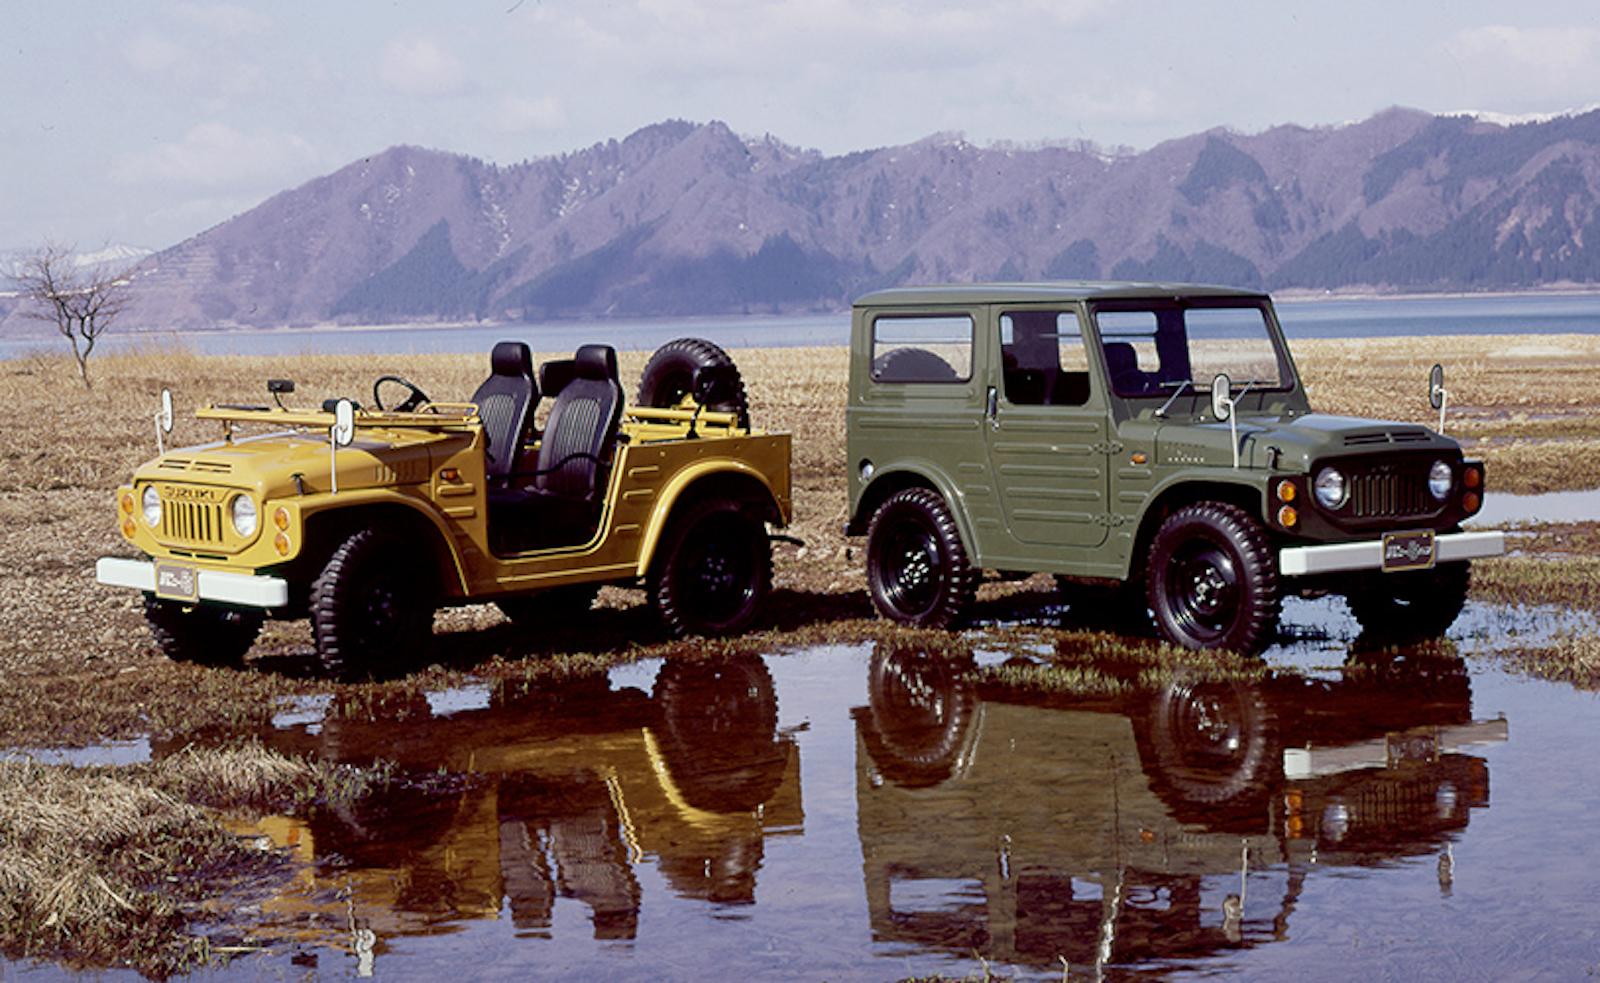 Suzuki Jimny Japan Automotive Hall Of Fame 3